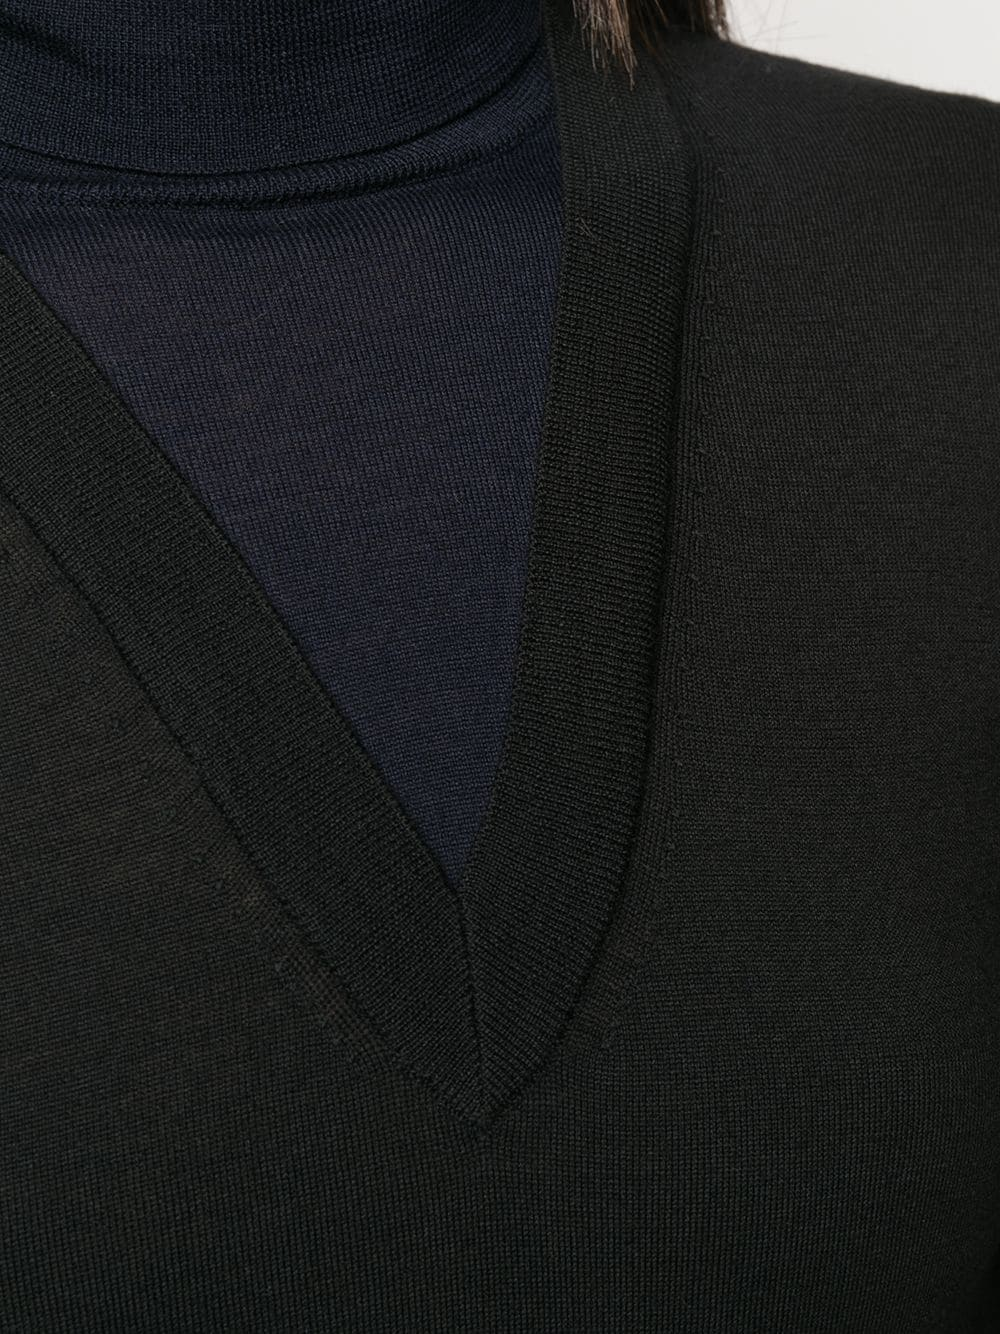 Maglia collo alto DRIES VAN NOTEN | Felpa | TEVIN 8701BLACK